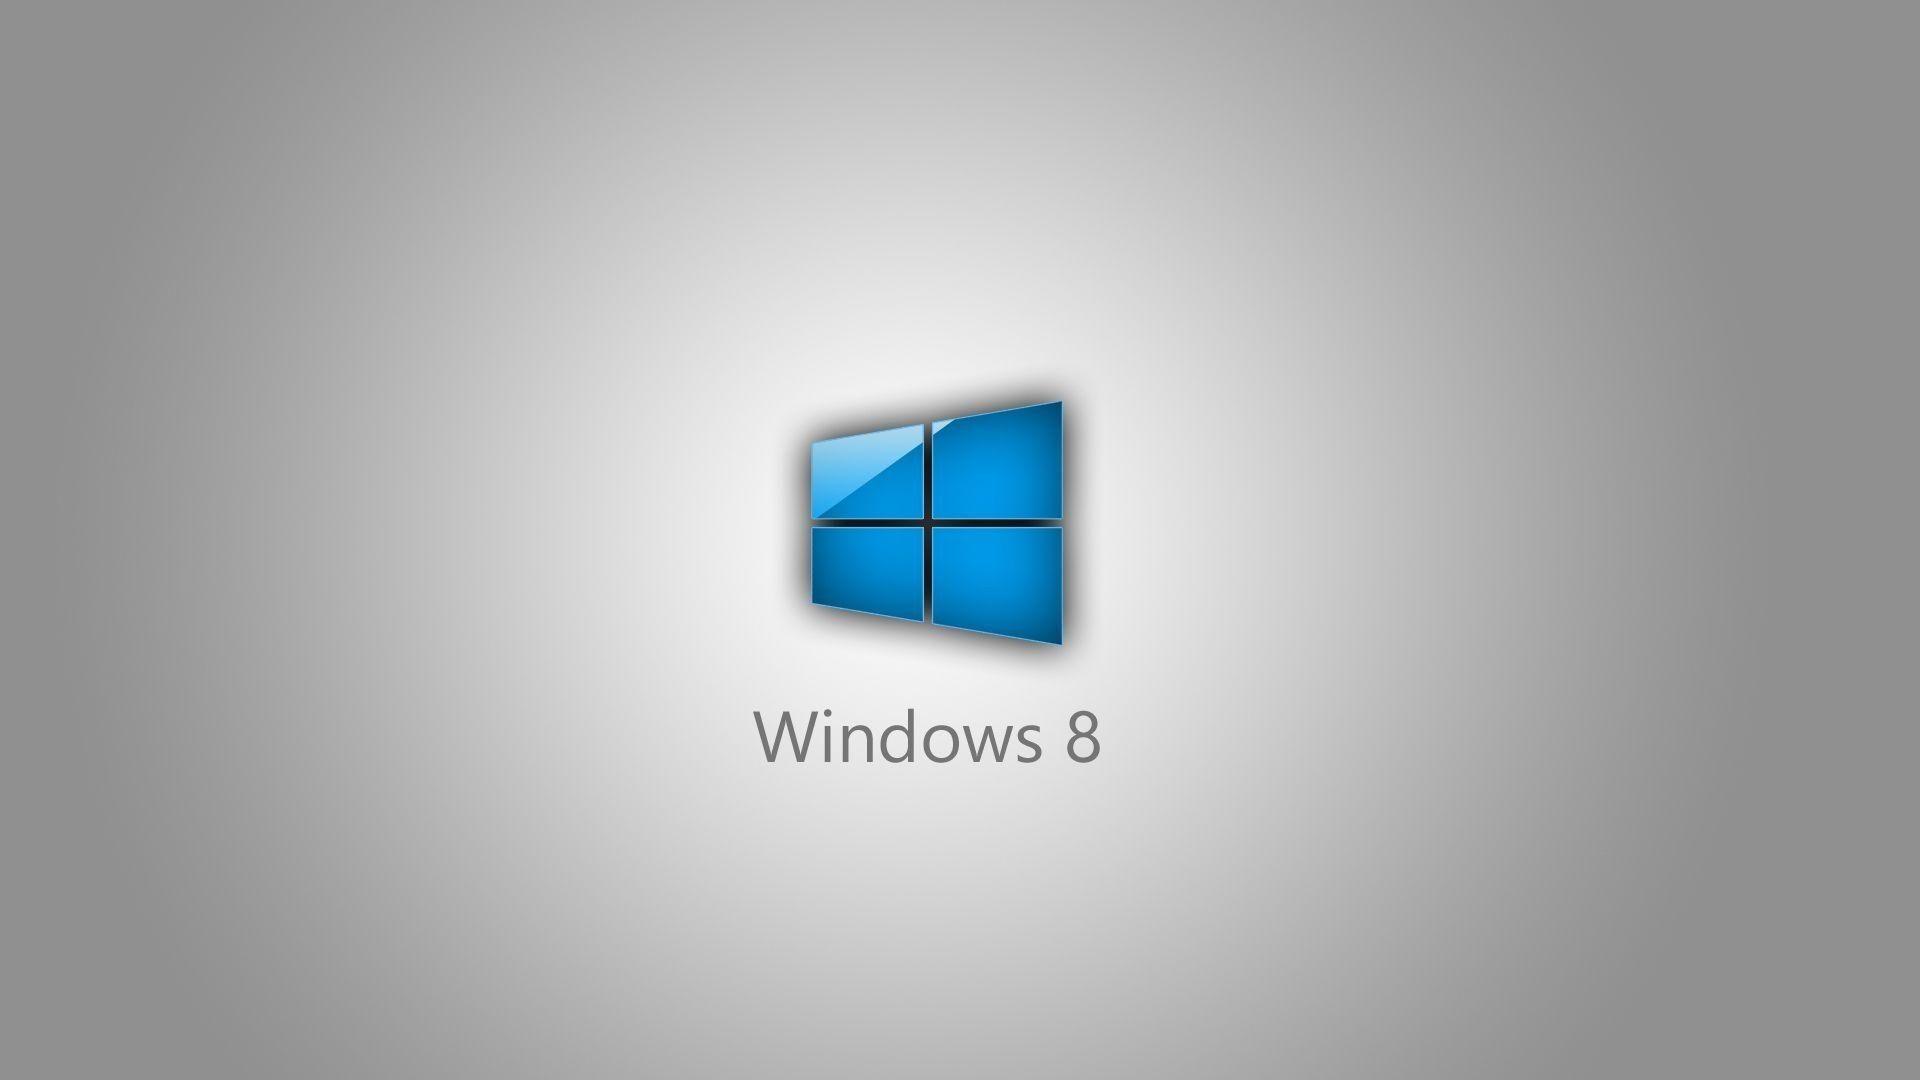 10 Latest Windows 8 Wallpaper Hd 1080p Full Hd 1080p For Pc Desktop Windows Wallpaper Windows Desktop Wallpaper Hd Wallpaper 1080p windows 8 wallpaper hd 1920x1080